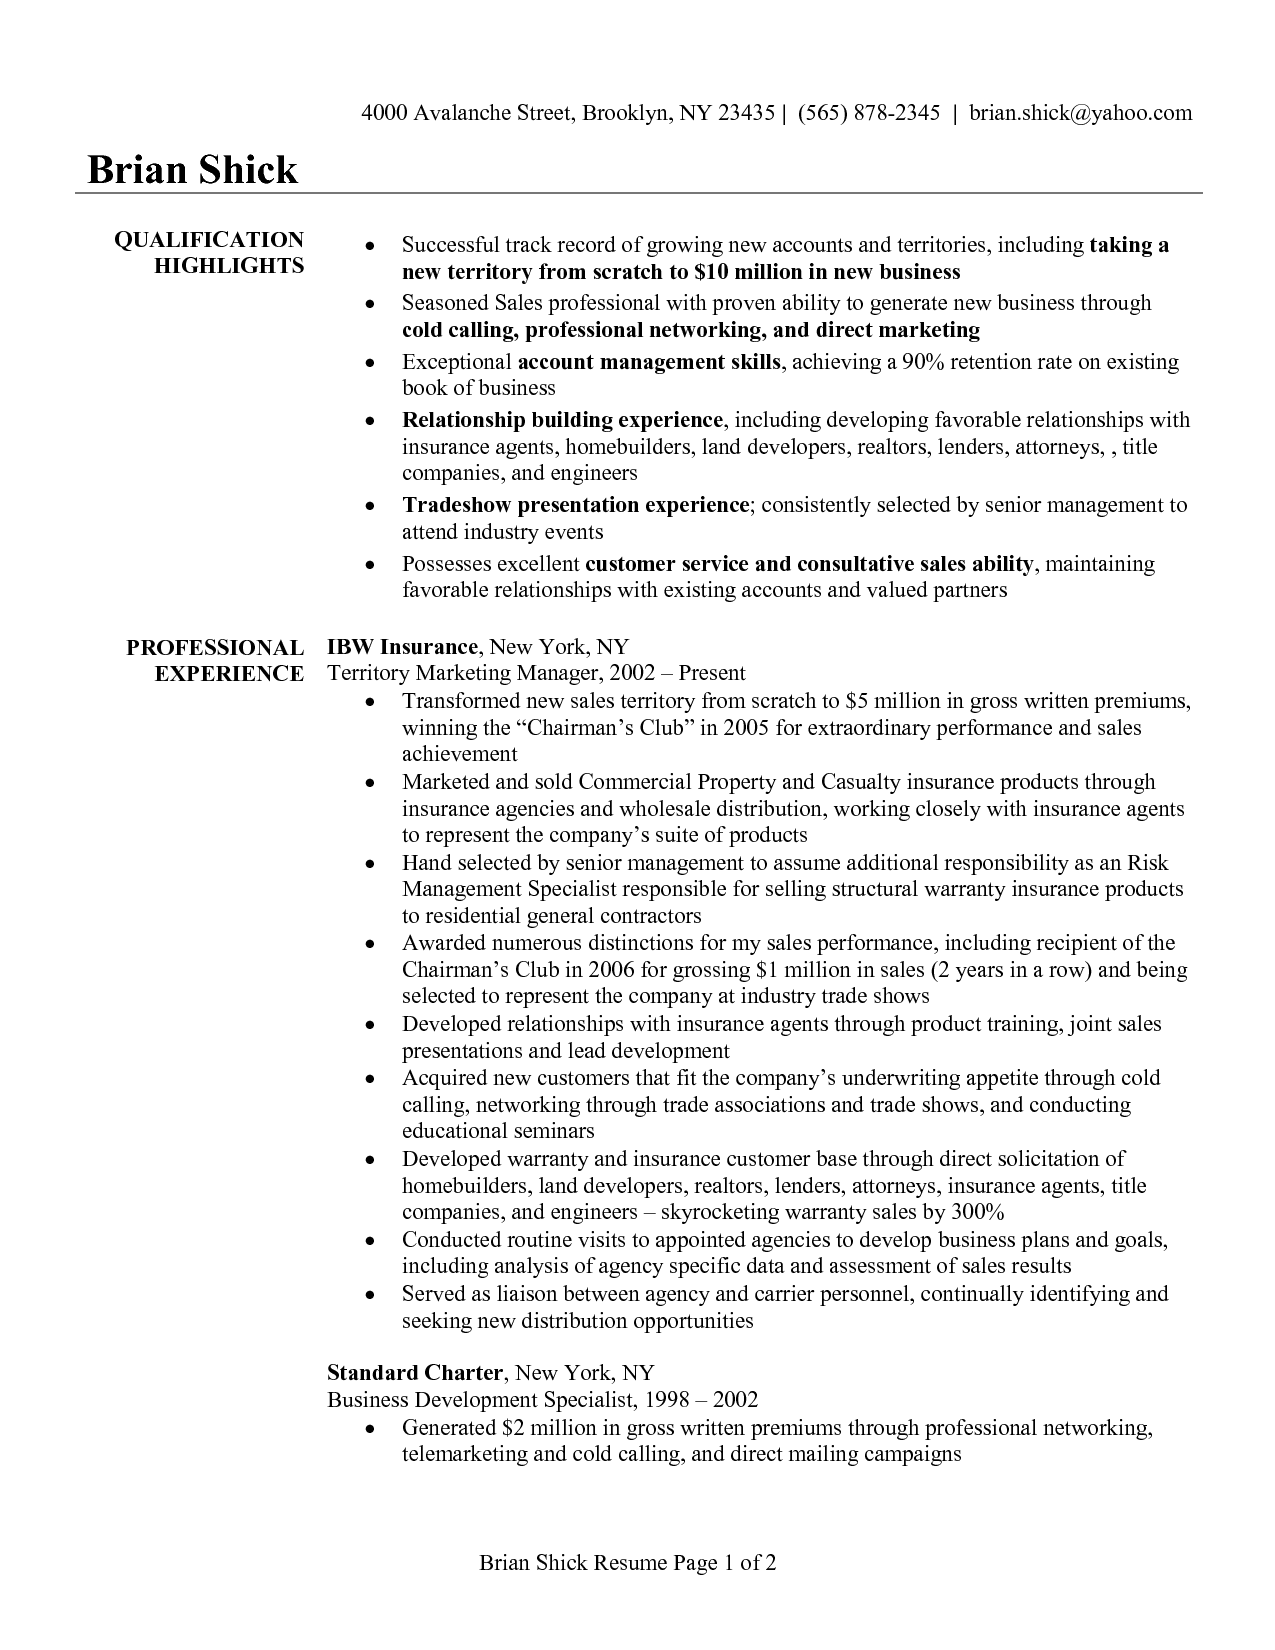 Pin By Resumejob On Resume Job Manager Resume Resume Job Resume Format